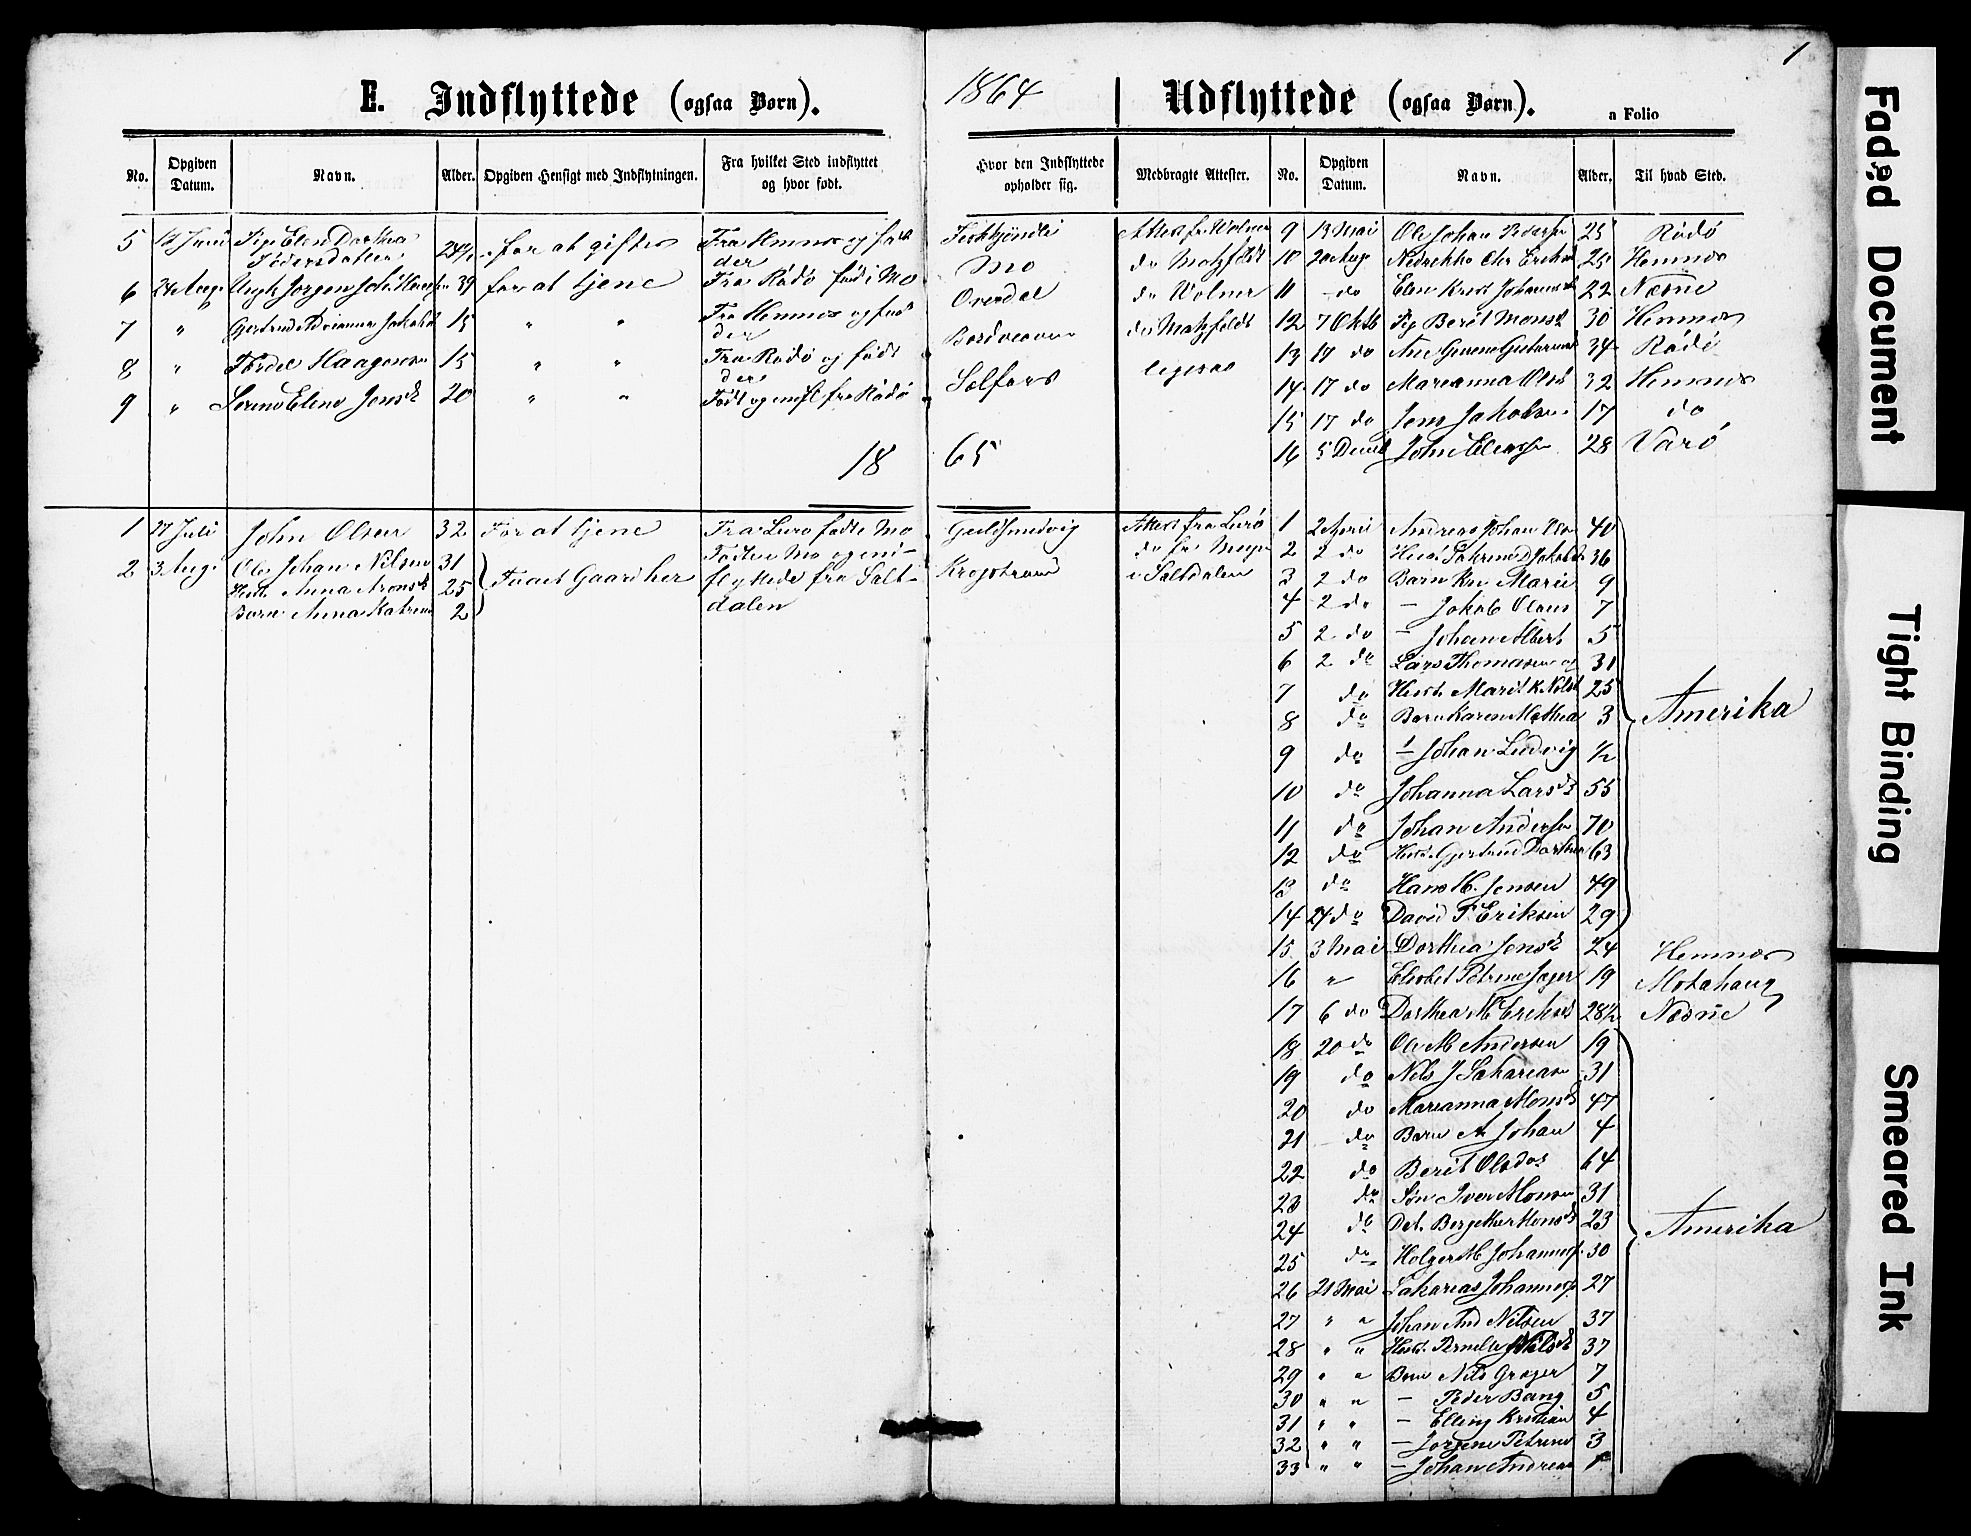 SAT, Ministerialprotokoller, klokkerbøker og fødselsregistre - Nordland, 827/L0419: Klokkerbok nr. 827C08, 1864-1885, s. 1